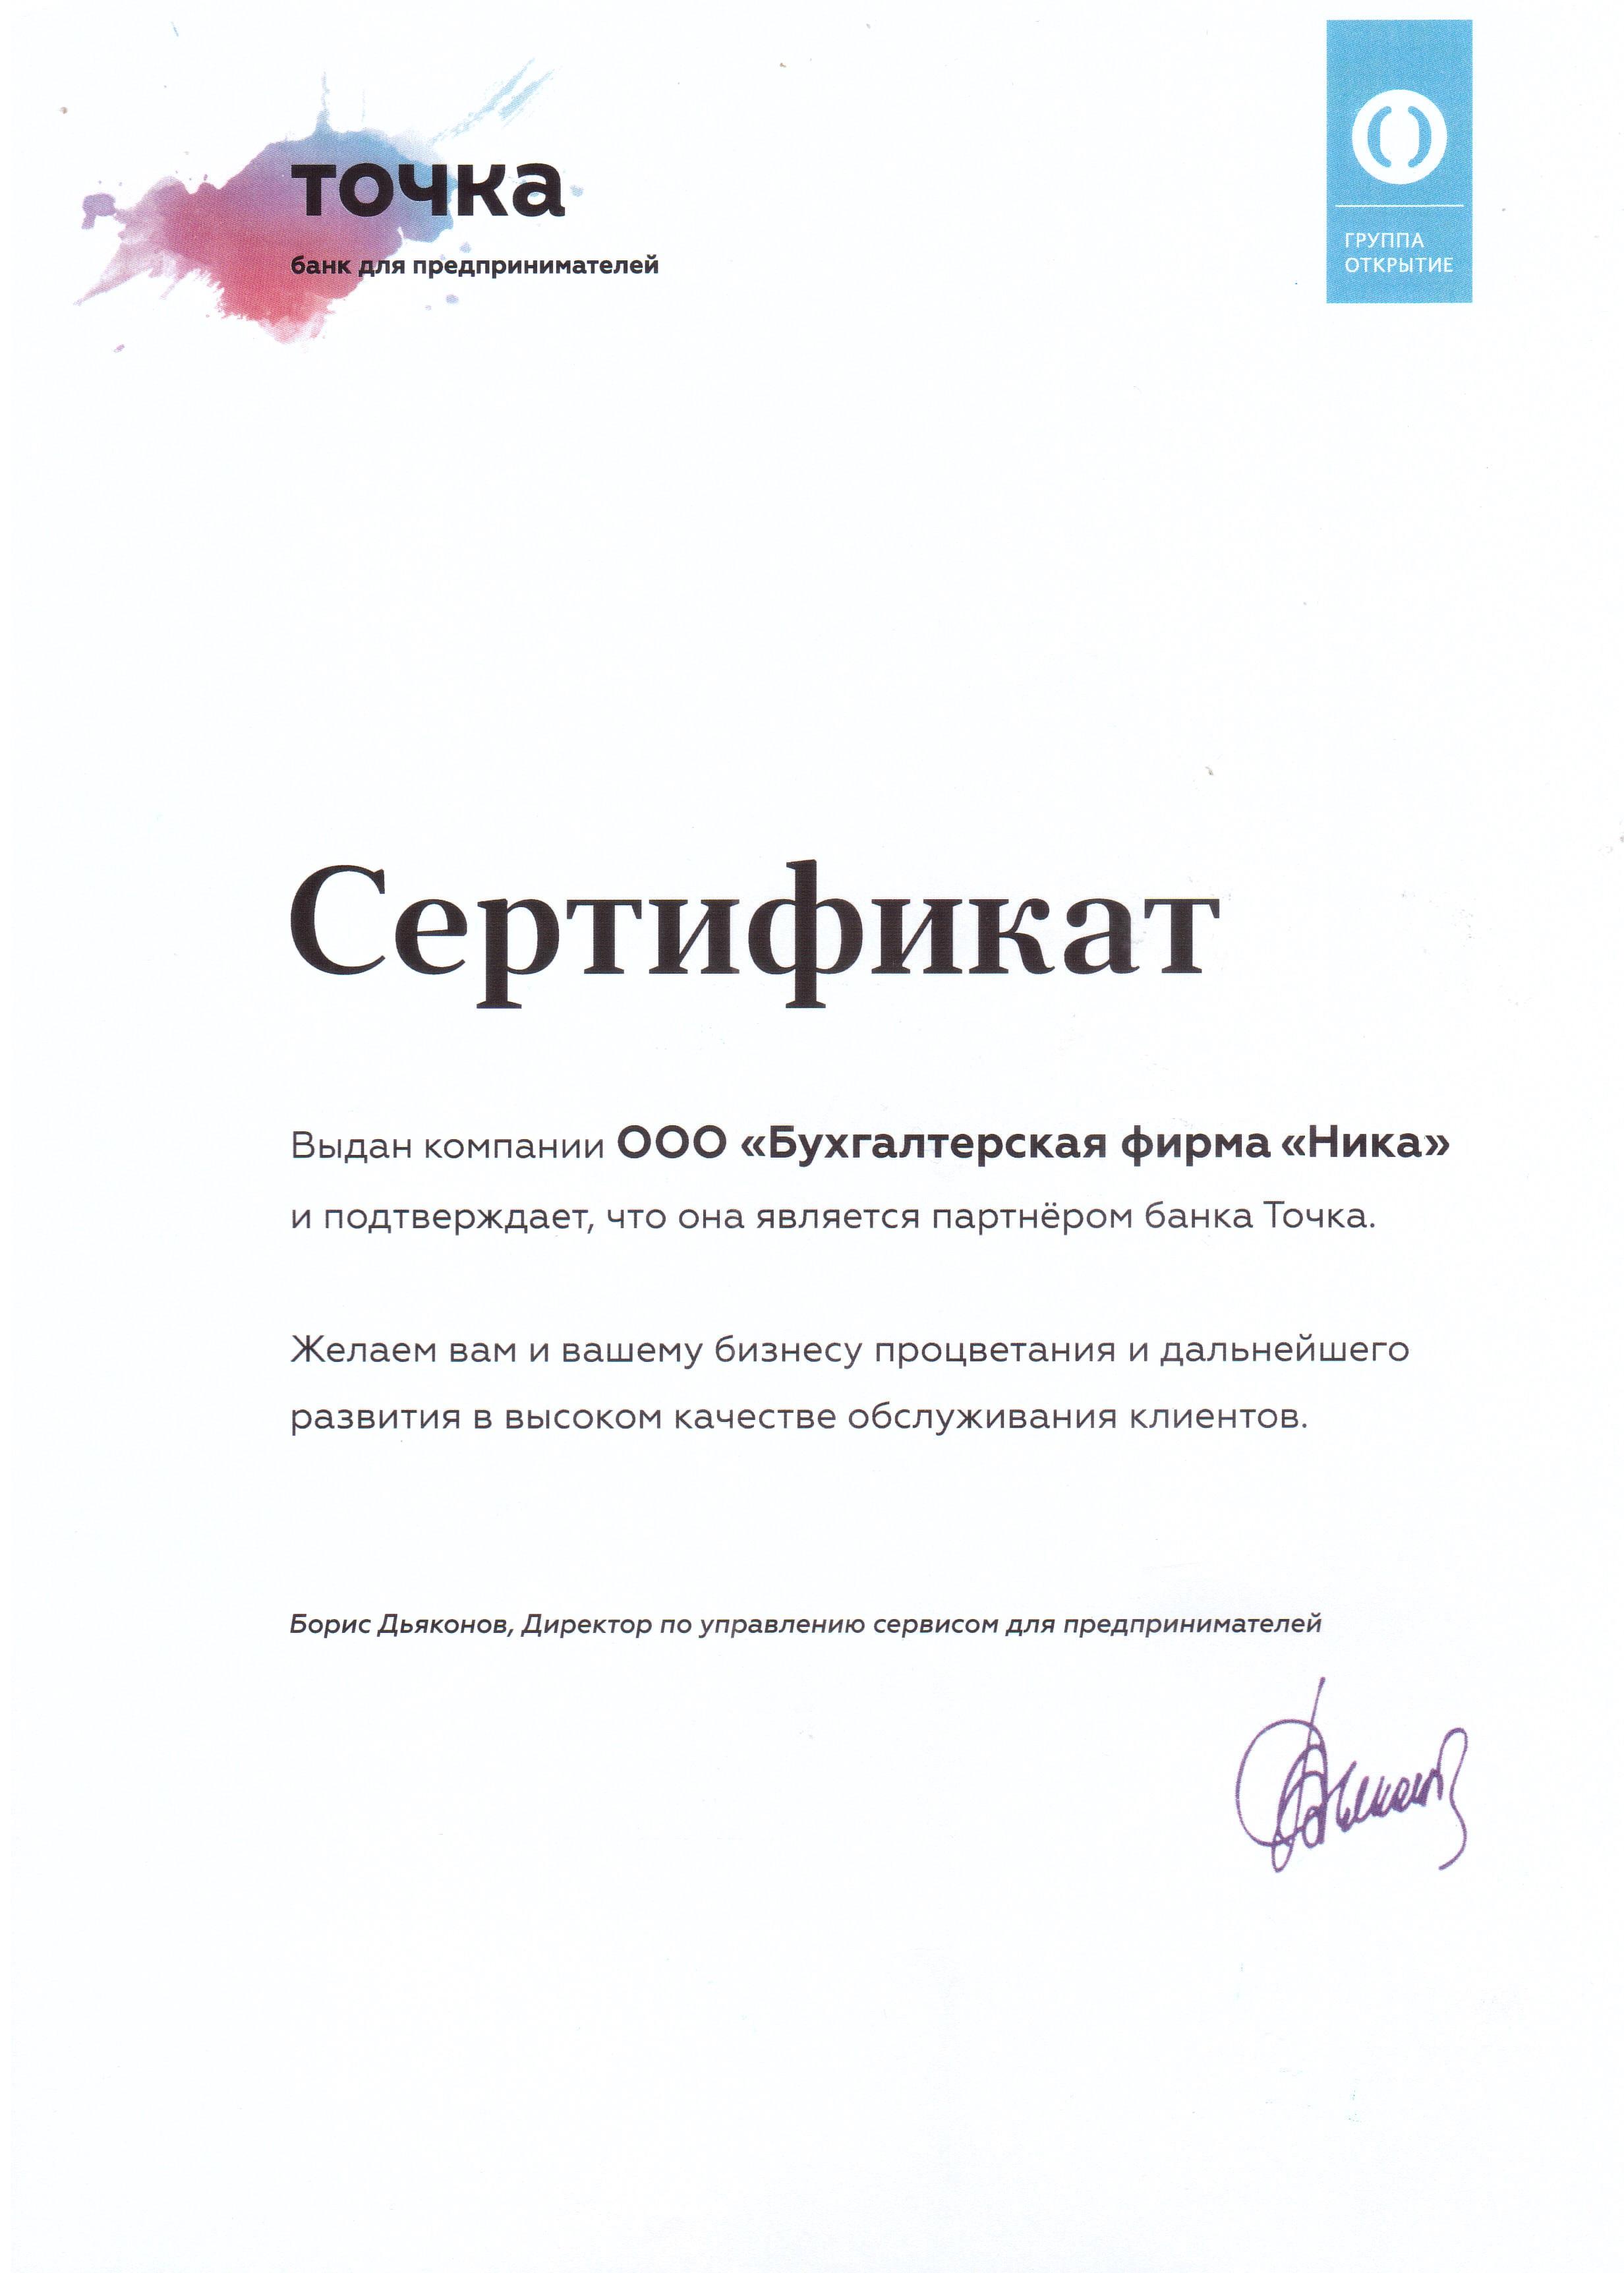 Сертификат Точка